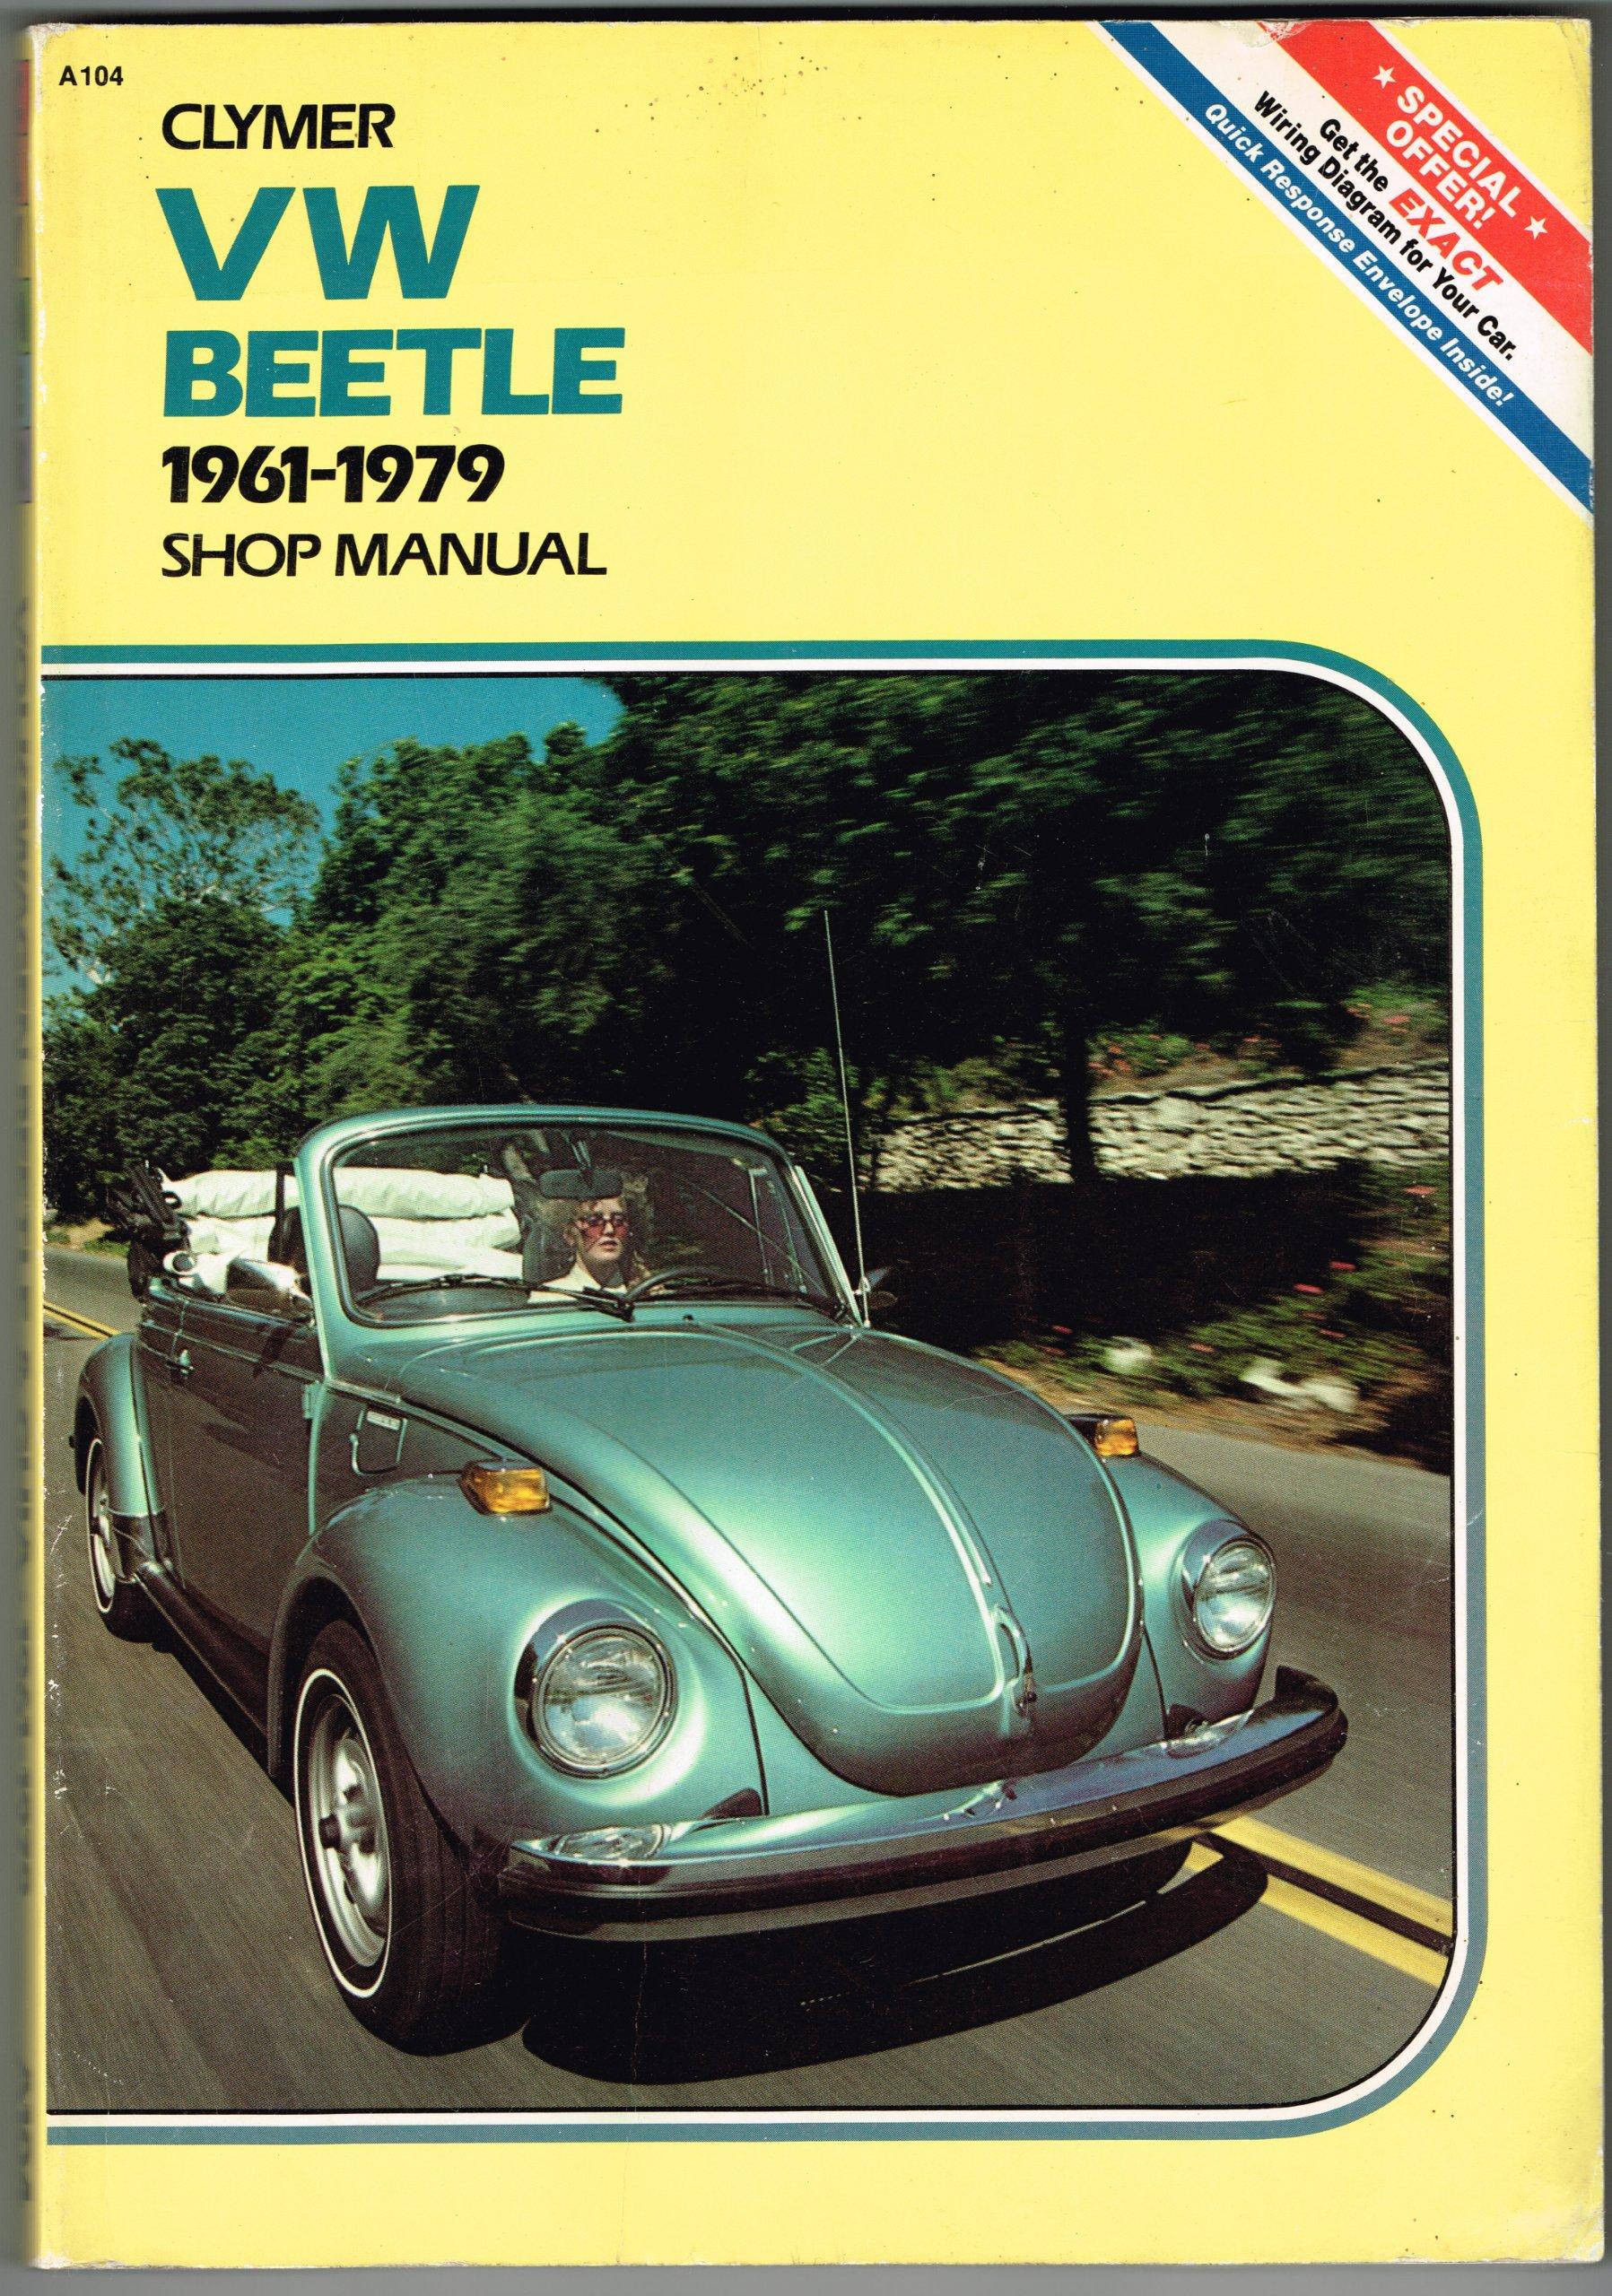 volkswagen beetle and ghia 1961 1979 shop manual eric jorgensen rh amazon com volkswagen beetle manual window crank bracket volkswagen beetle manual